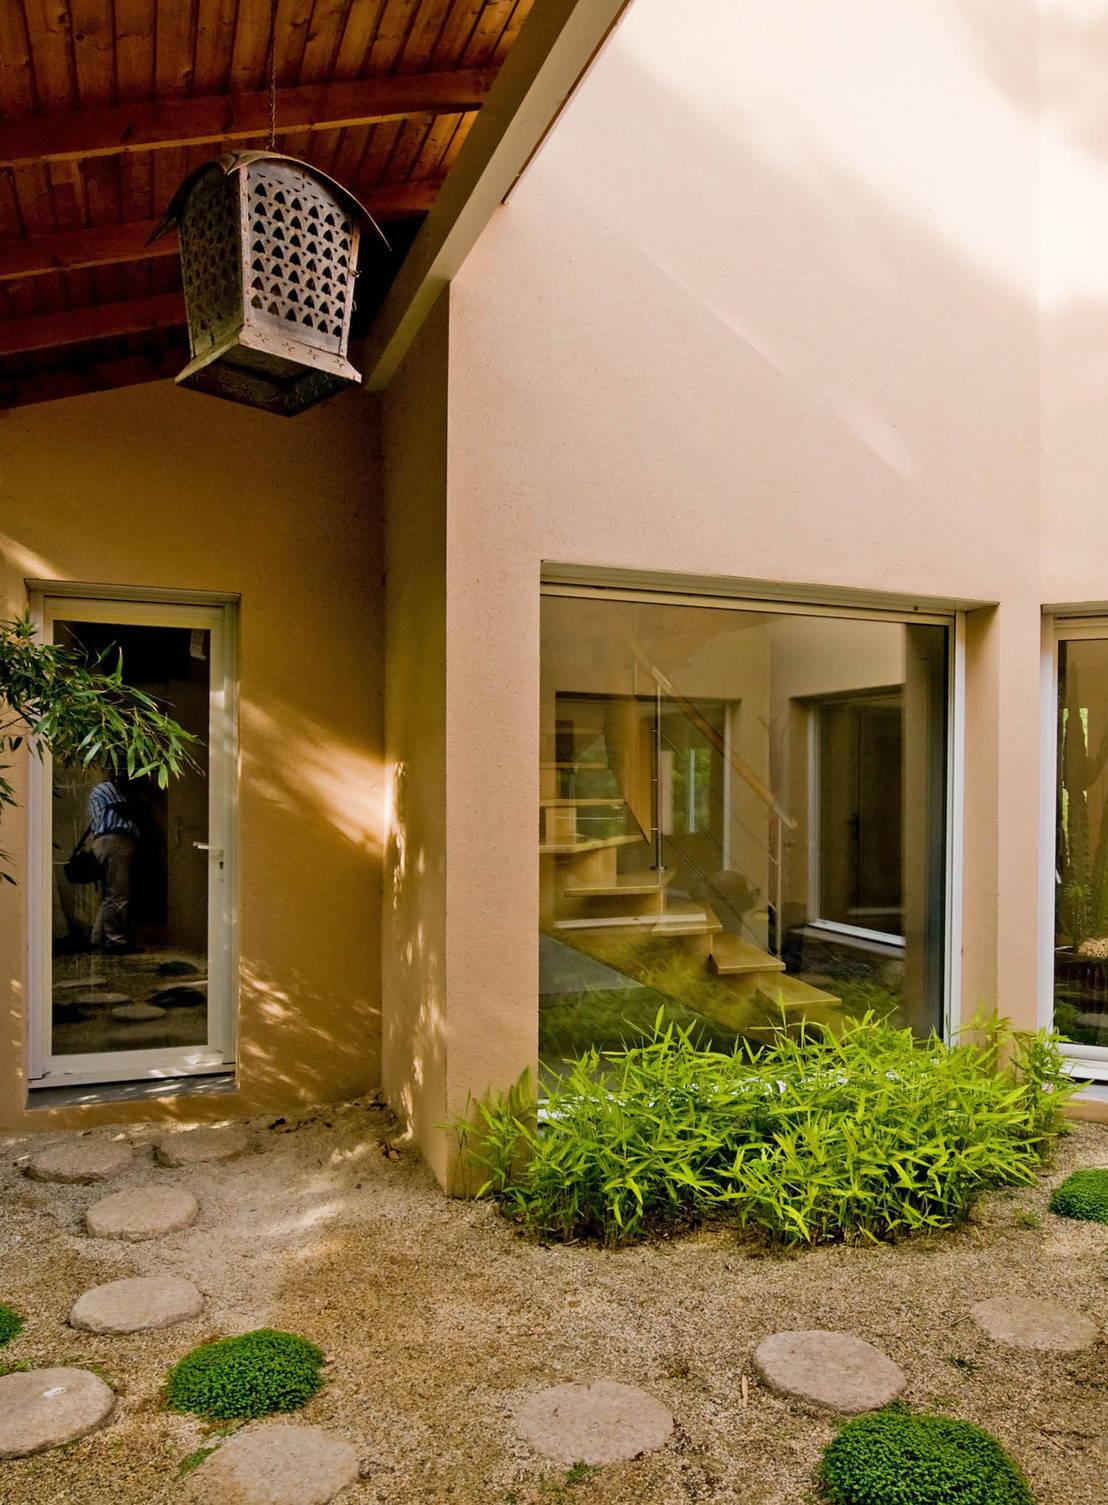 maison l 39 architecture originale avce piscine by pierre bernard cr ation homify. Black Bedroom Furniture Sets. Home Design Ideas